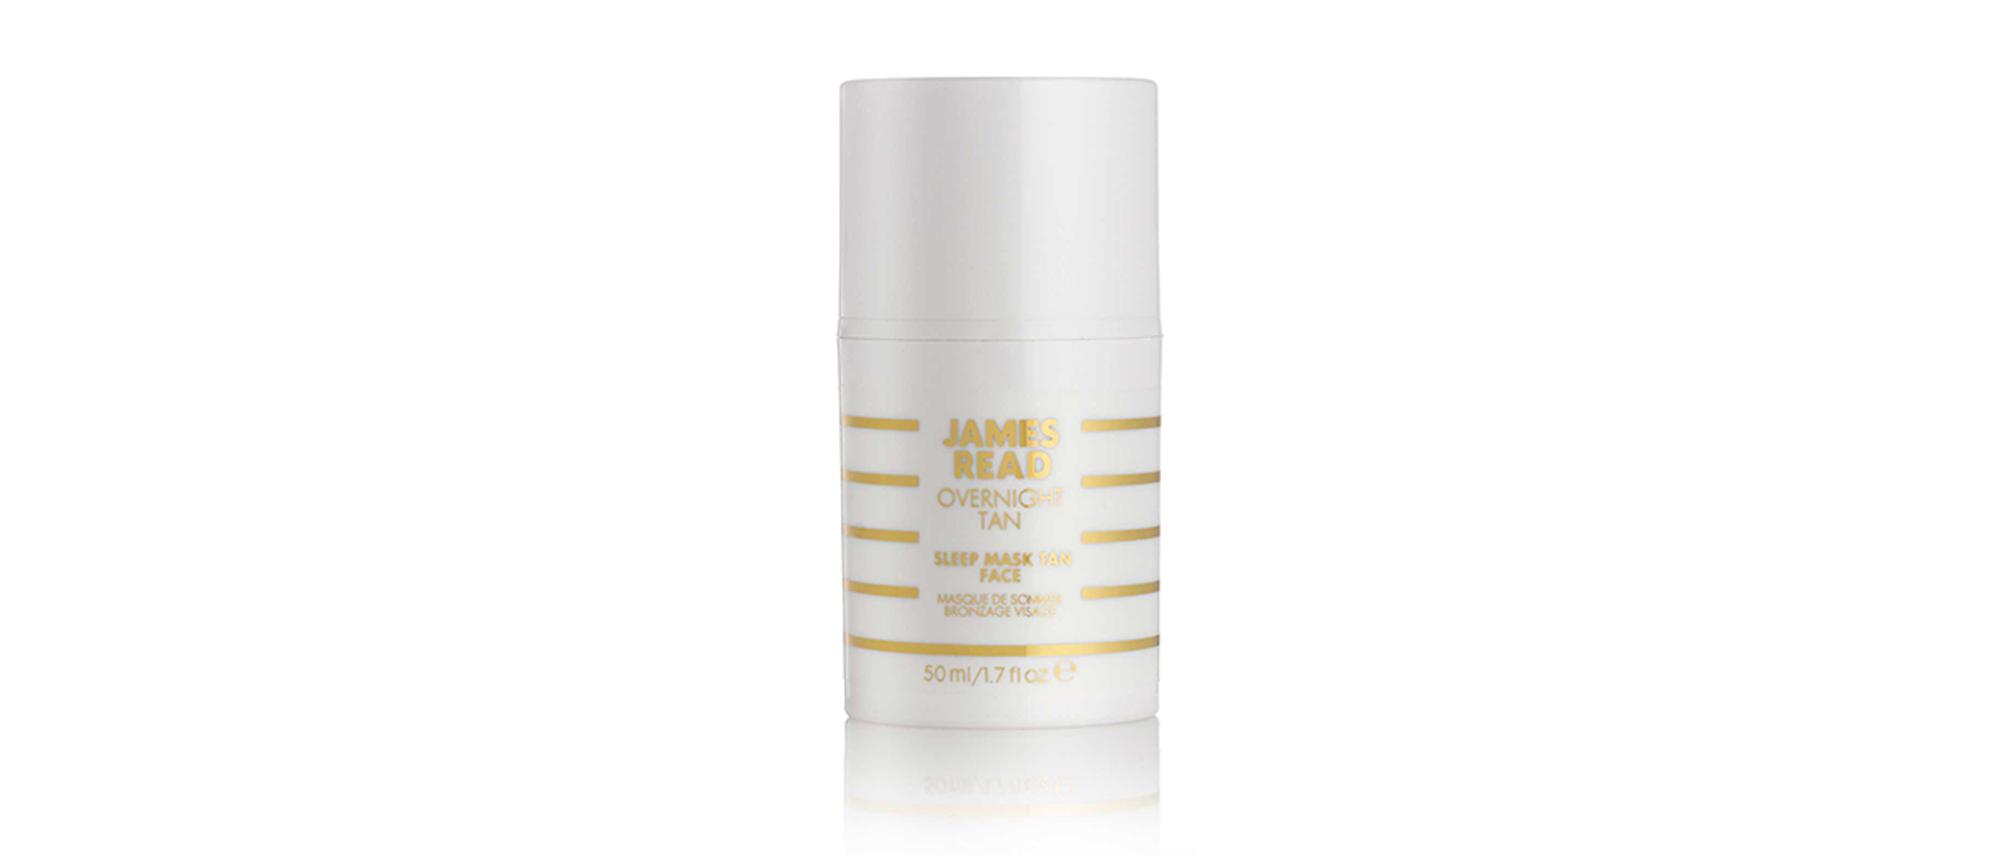 James Read | Sleep Mask Tan Face | Overnight-Gesichtsmaske | 29,50 Euro